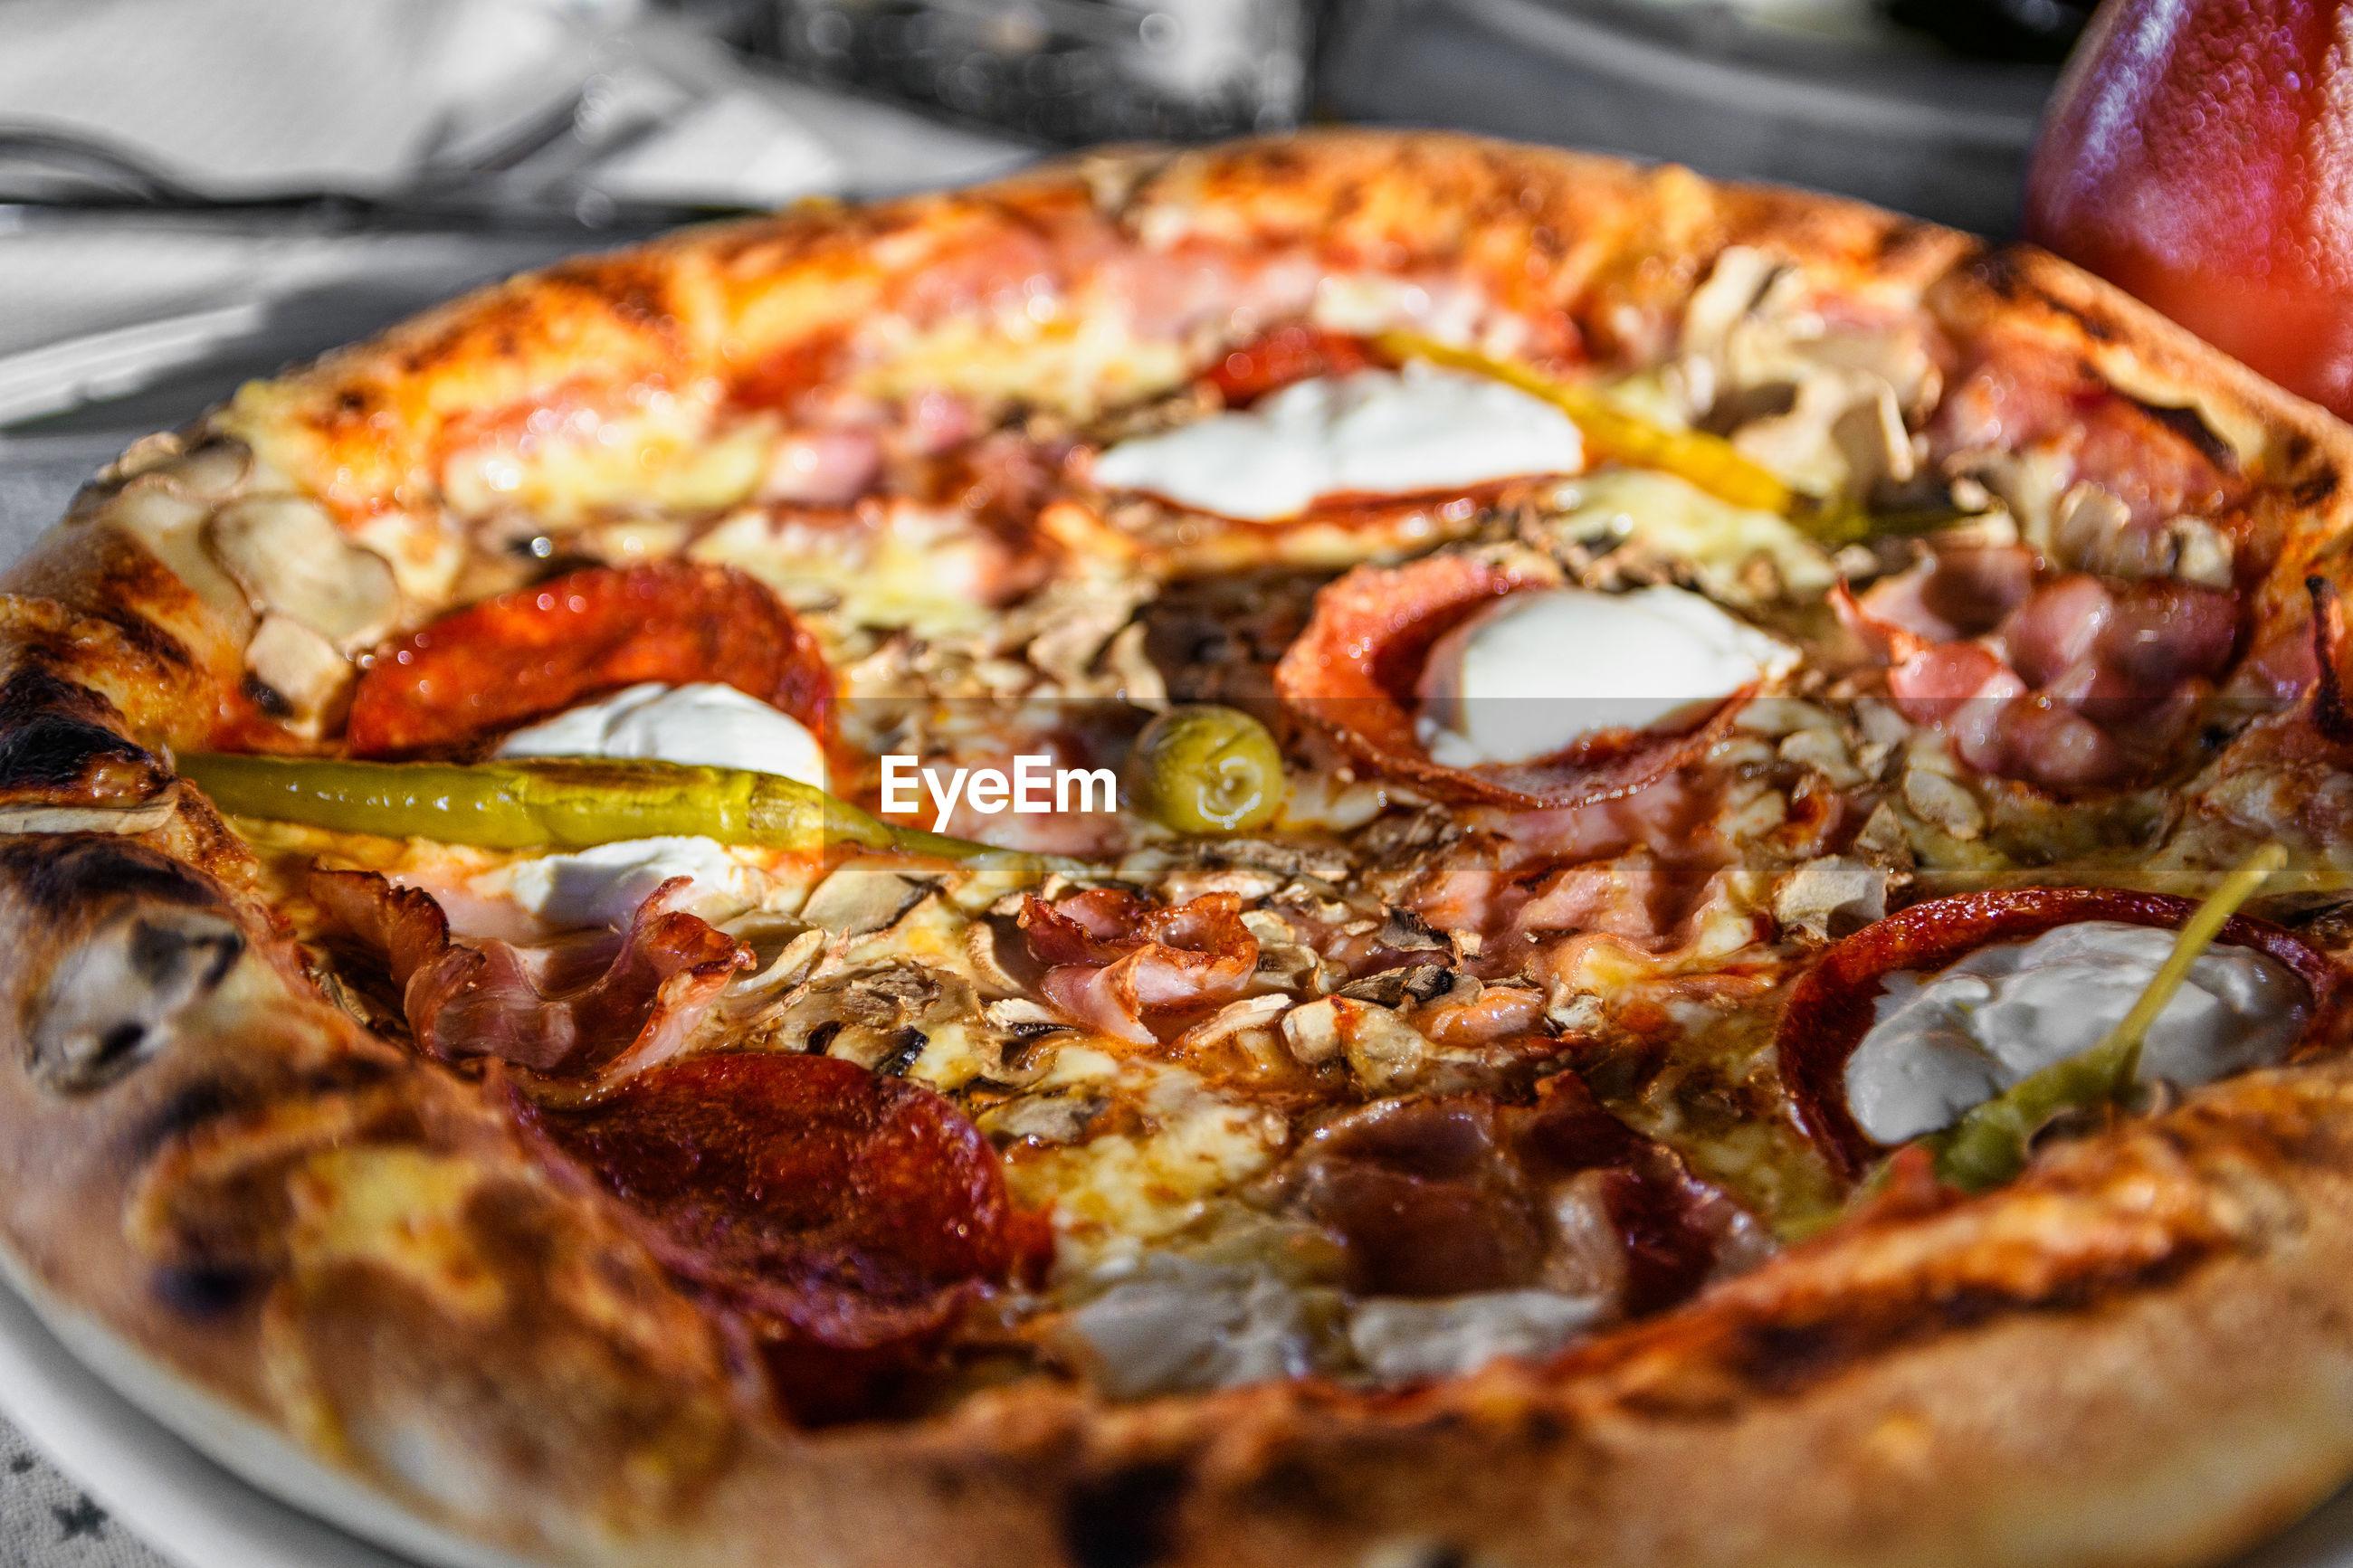 Closeup photo of pizza.